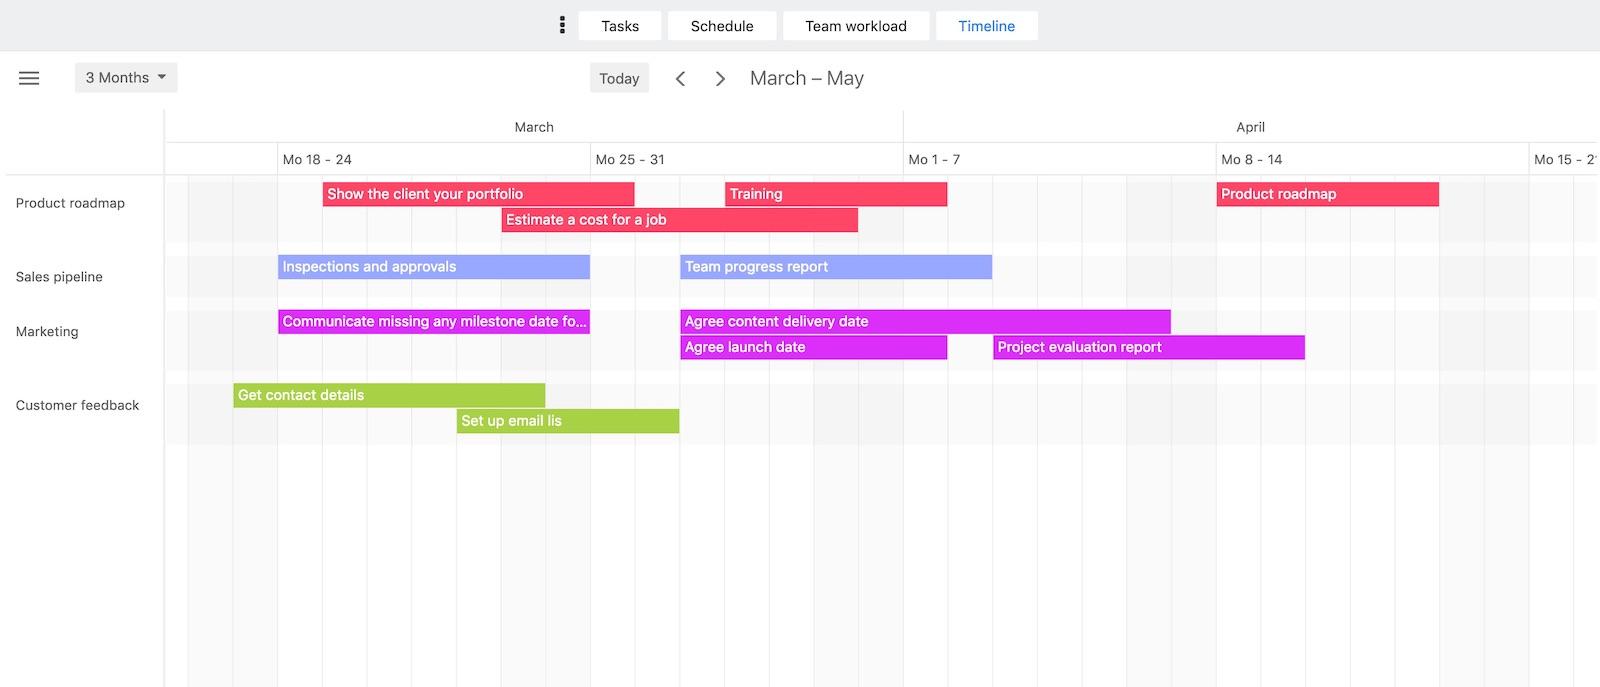 Calendar project timeline